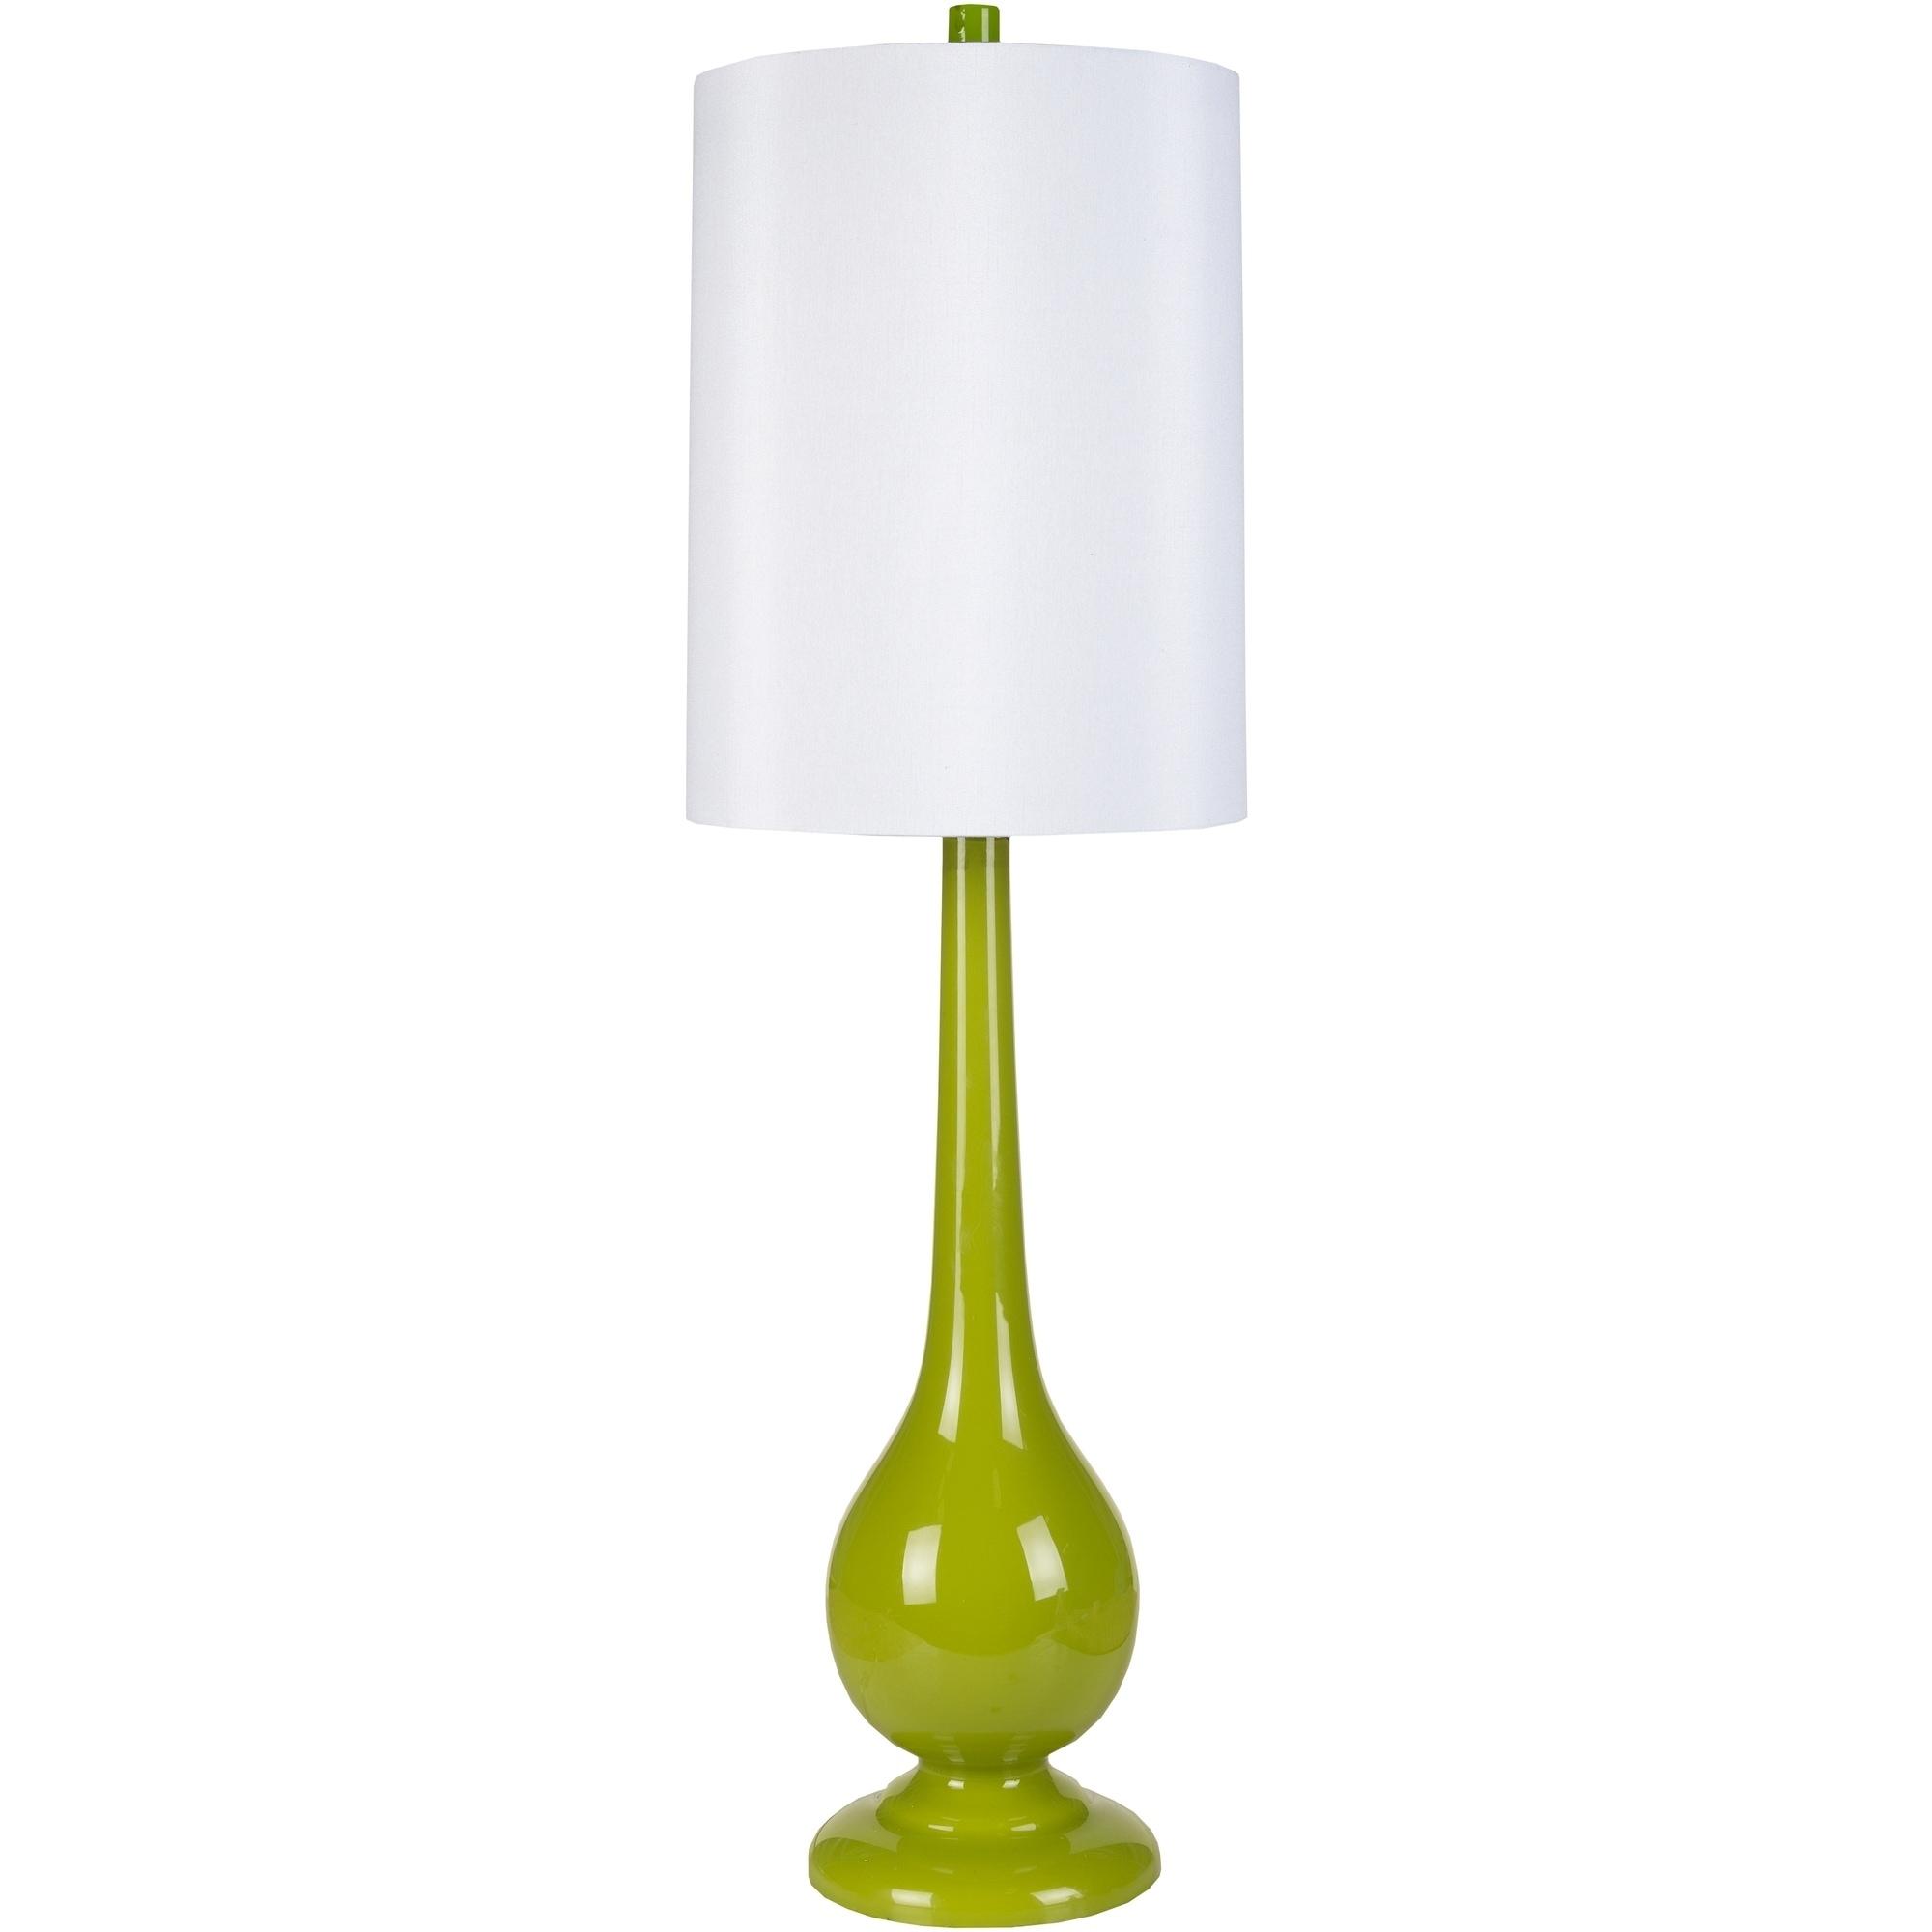 SURYA Brilliantly Bold Glass Table Lamp (Green - Glass Fi...